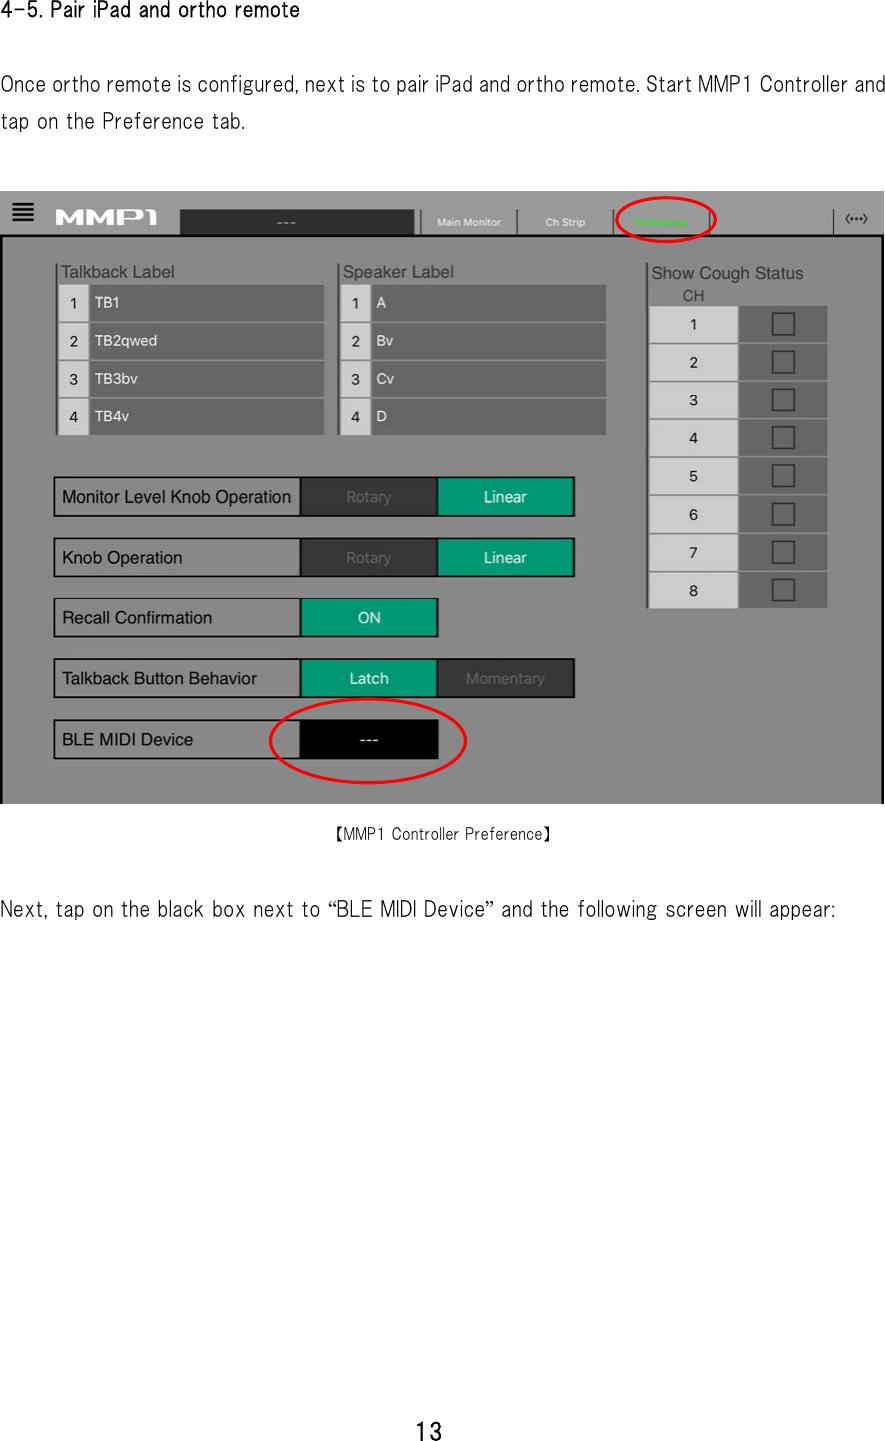 Yamaha Ortho Remote For MMP1 Setup Guide